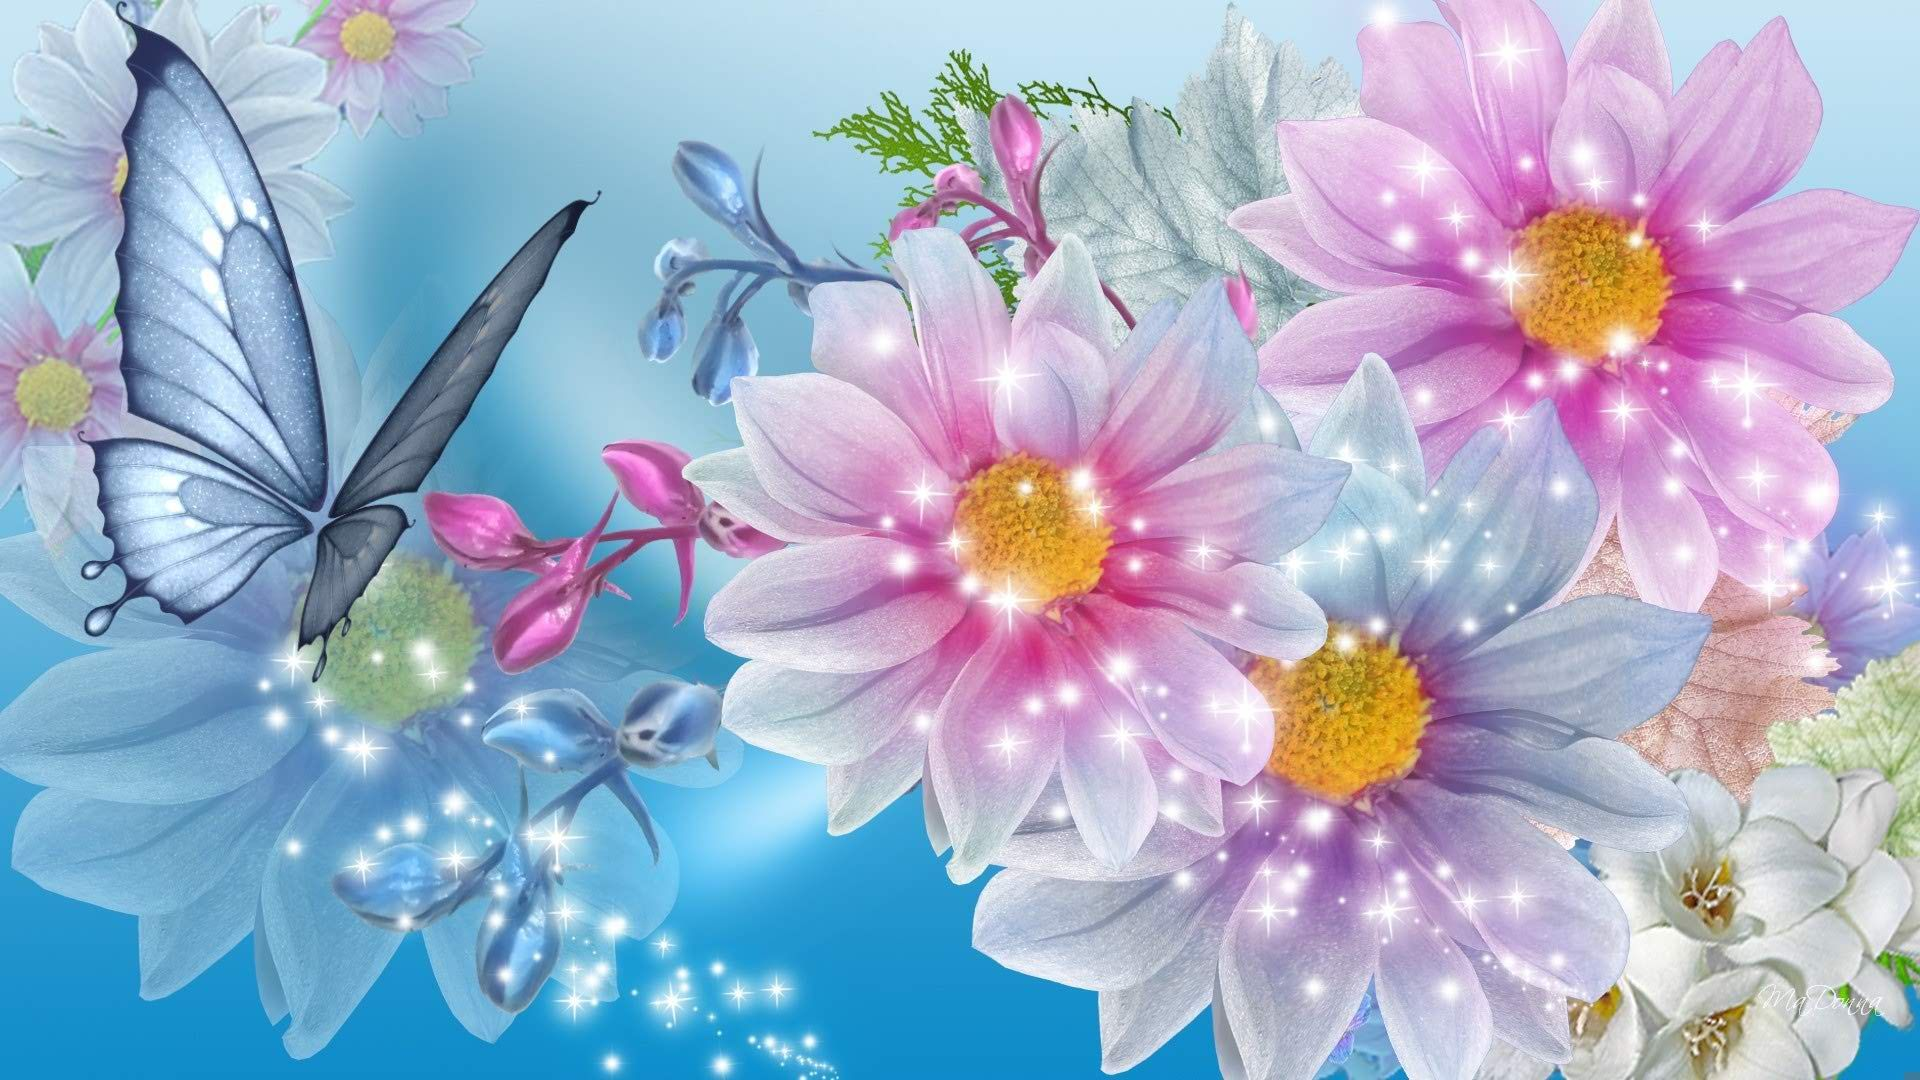 wallpaper nature flower high definition for desktop background on